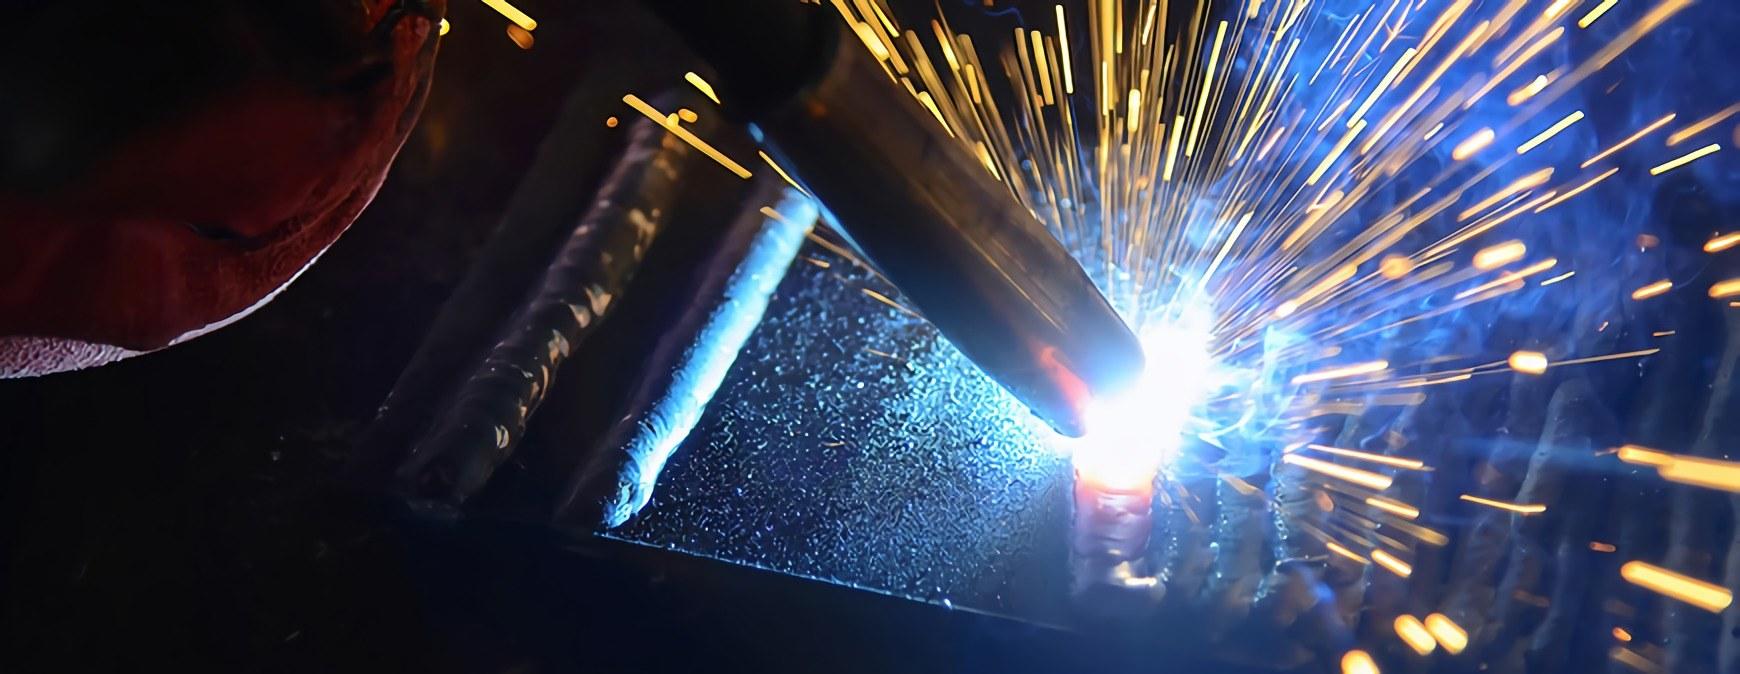 choosing a welding career